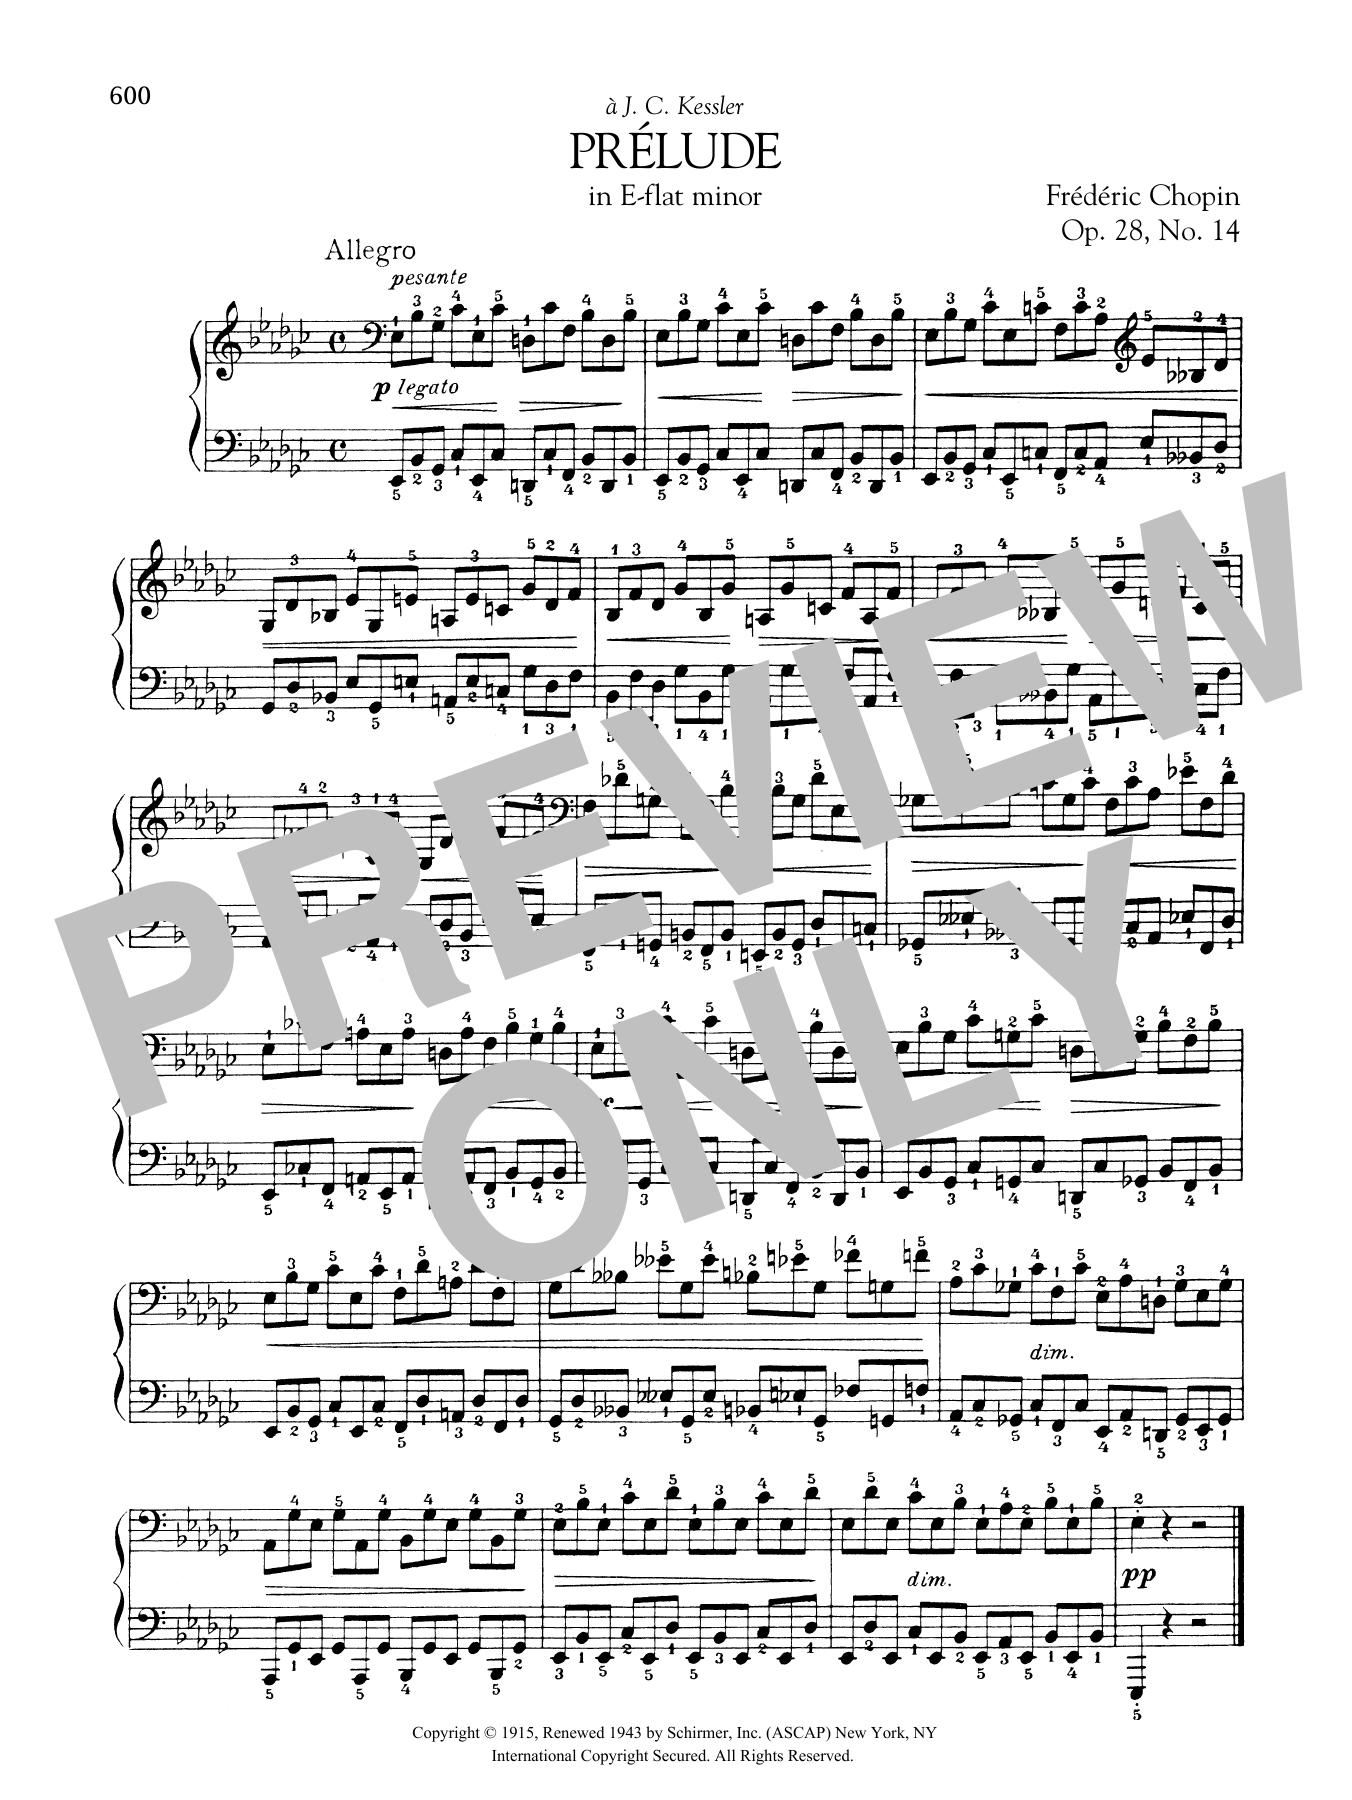 Prélude in E-flat minor, Op. 28, No. 14 Sheet Music